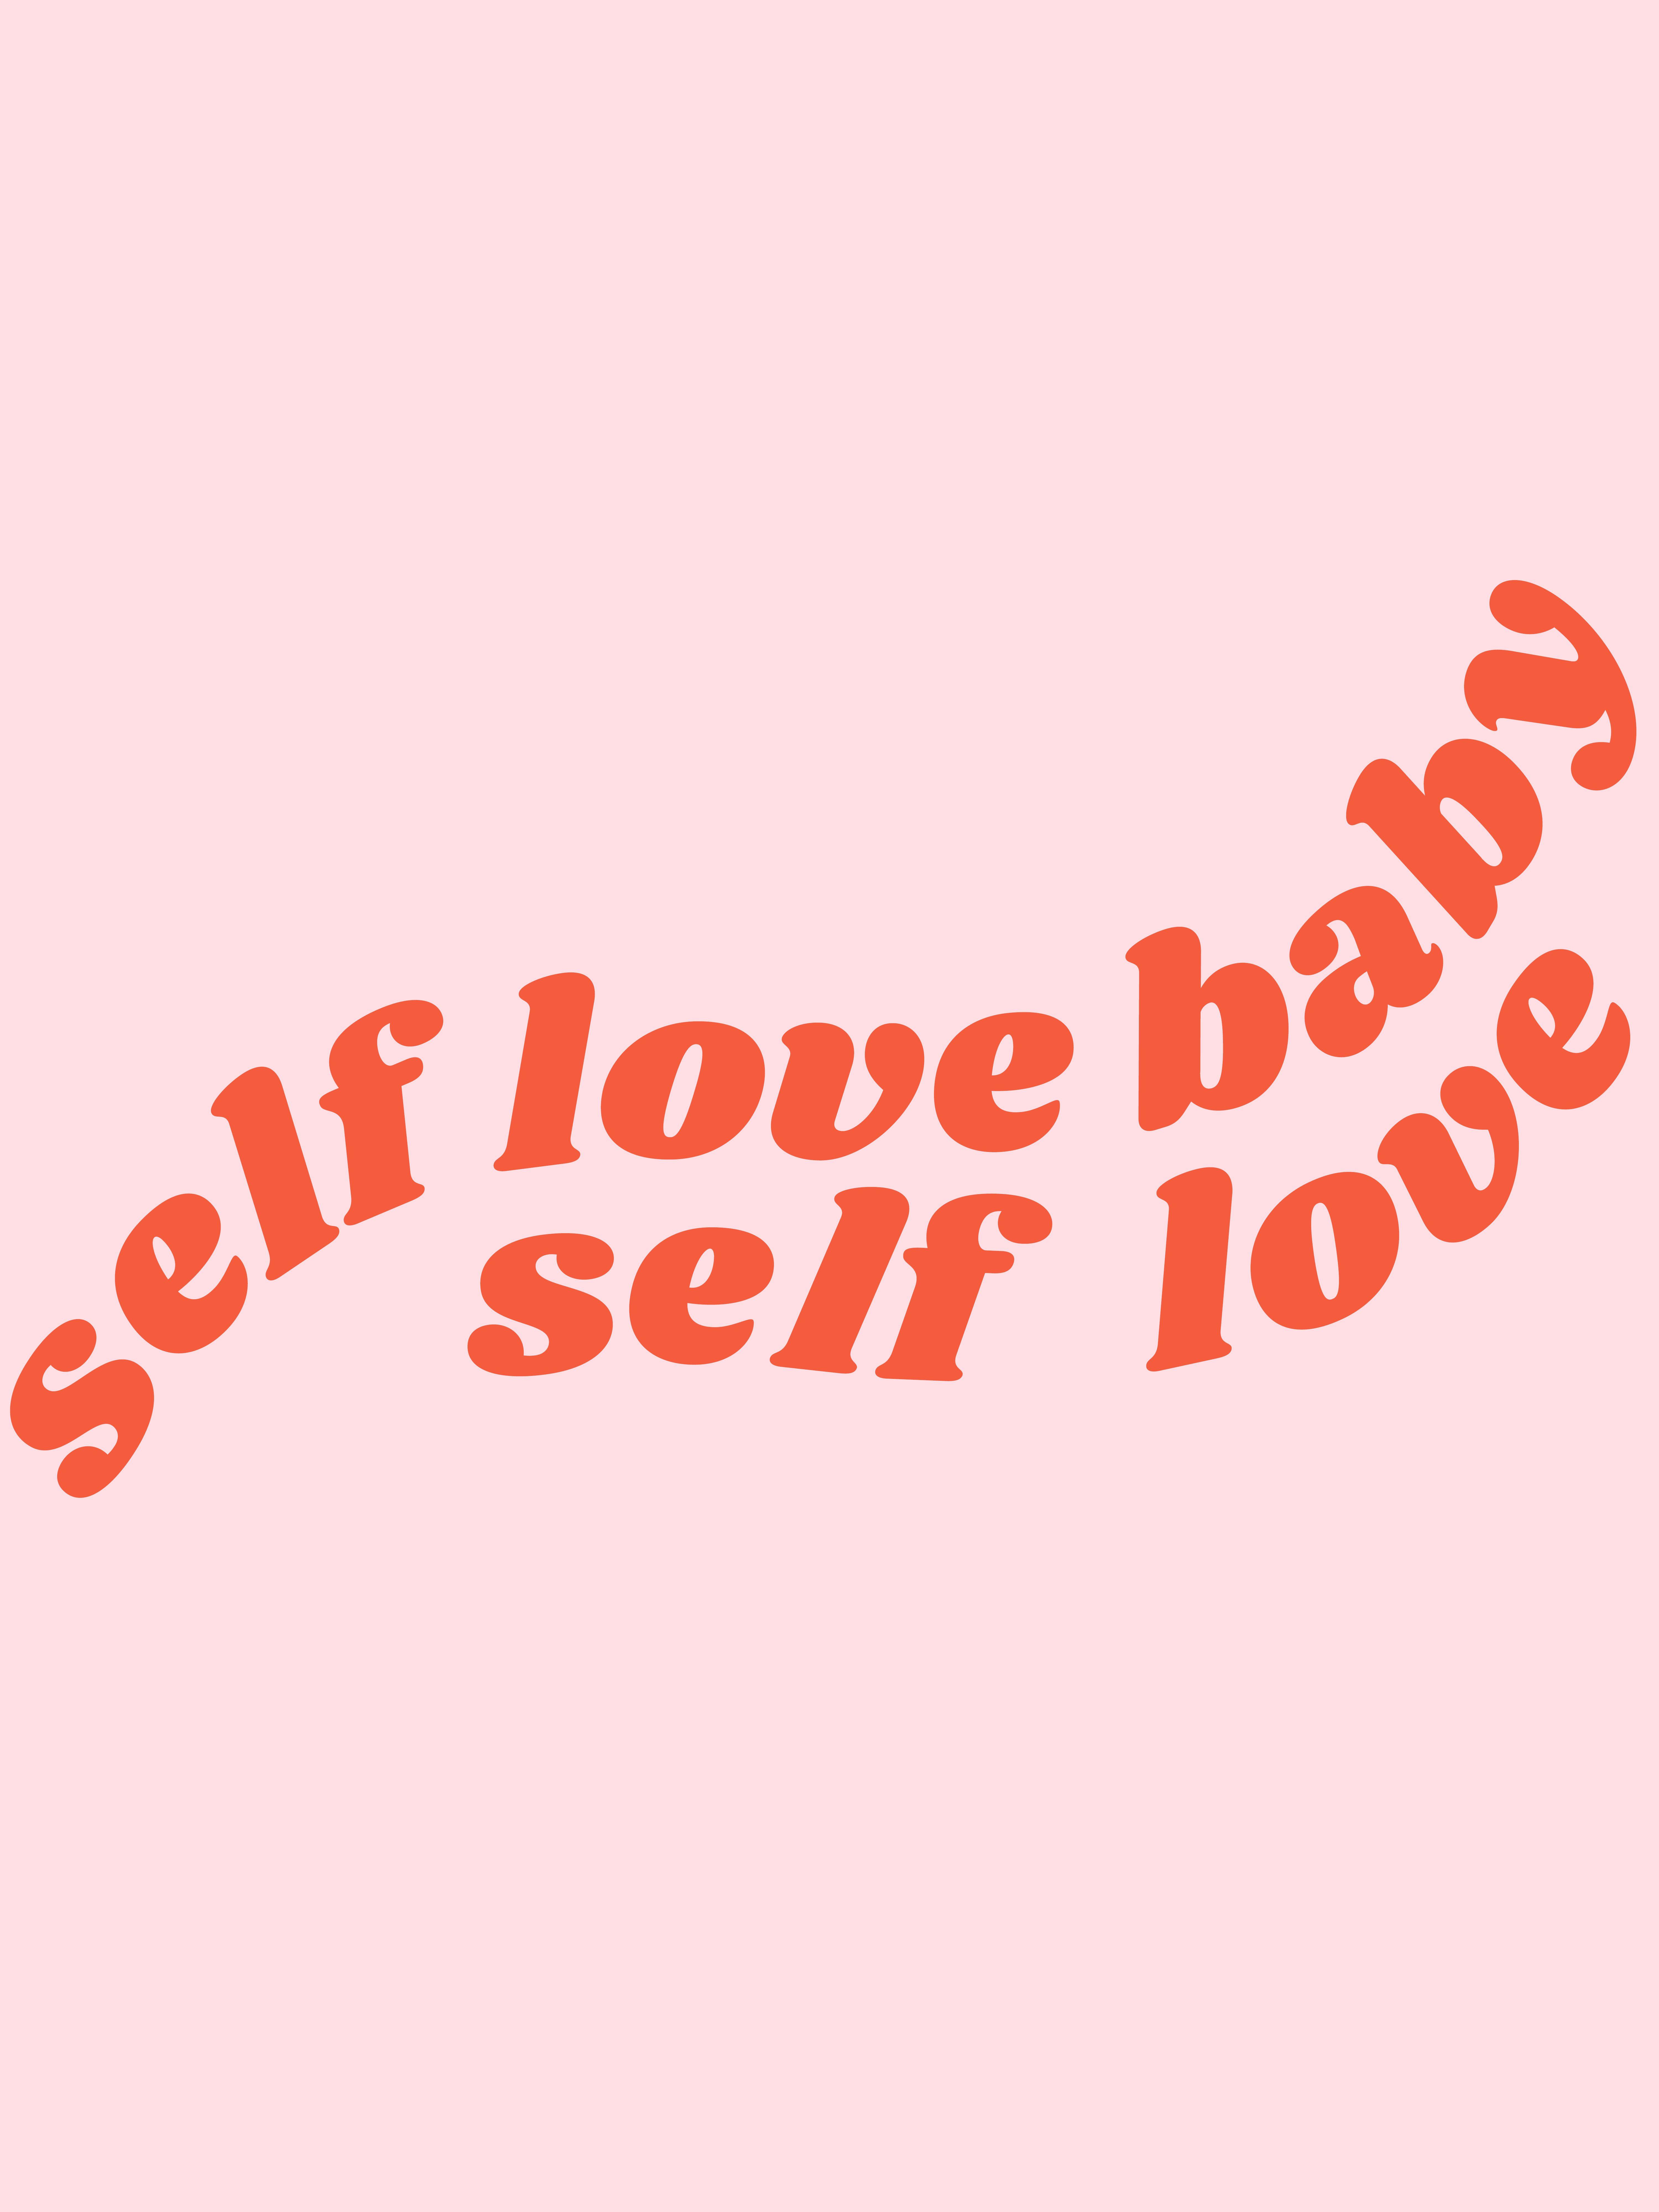 Self Love Tumblr : tumblr, Typutopia, Society, Glückliche, Wörter,, Words,, Sprüche, Glück